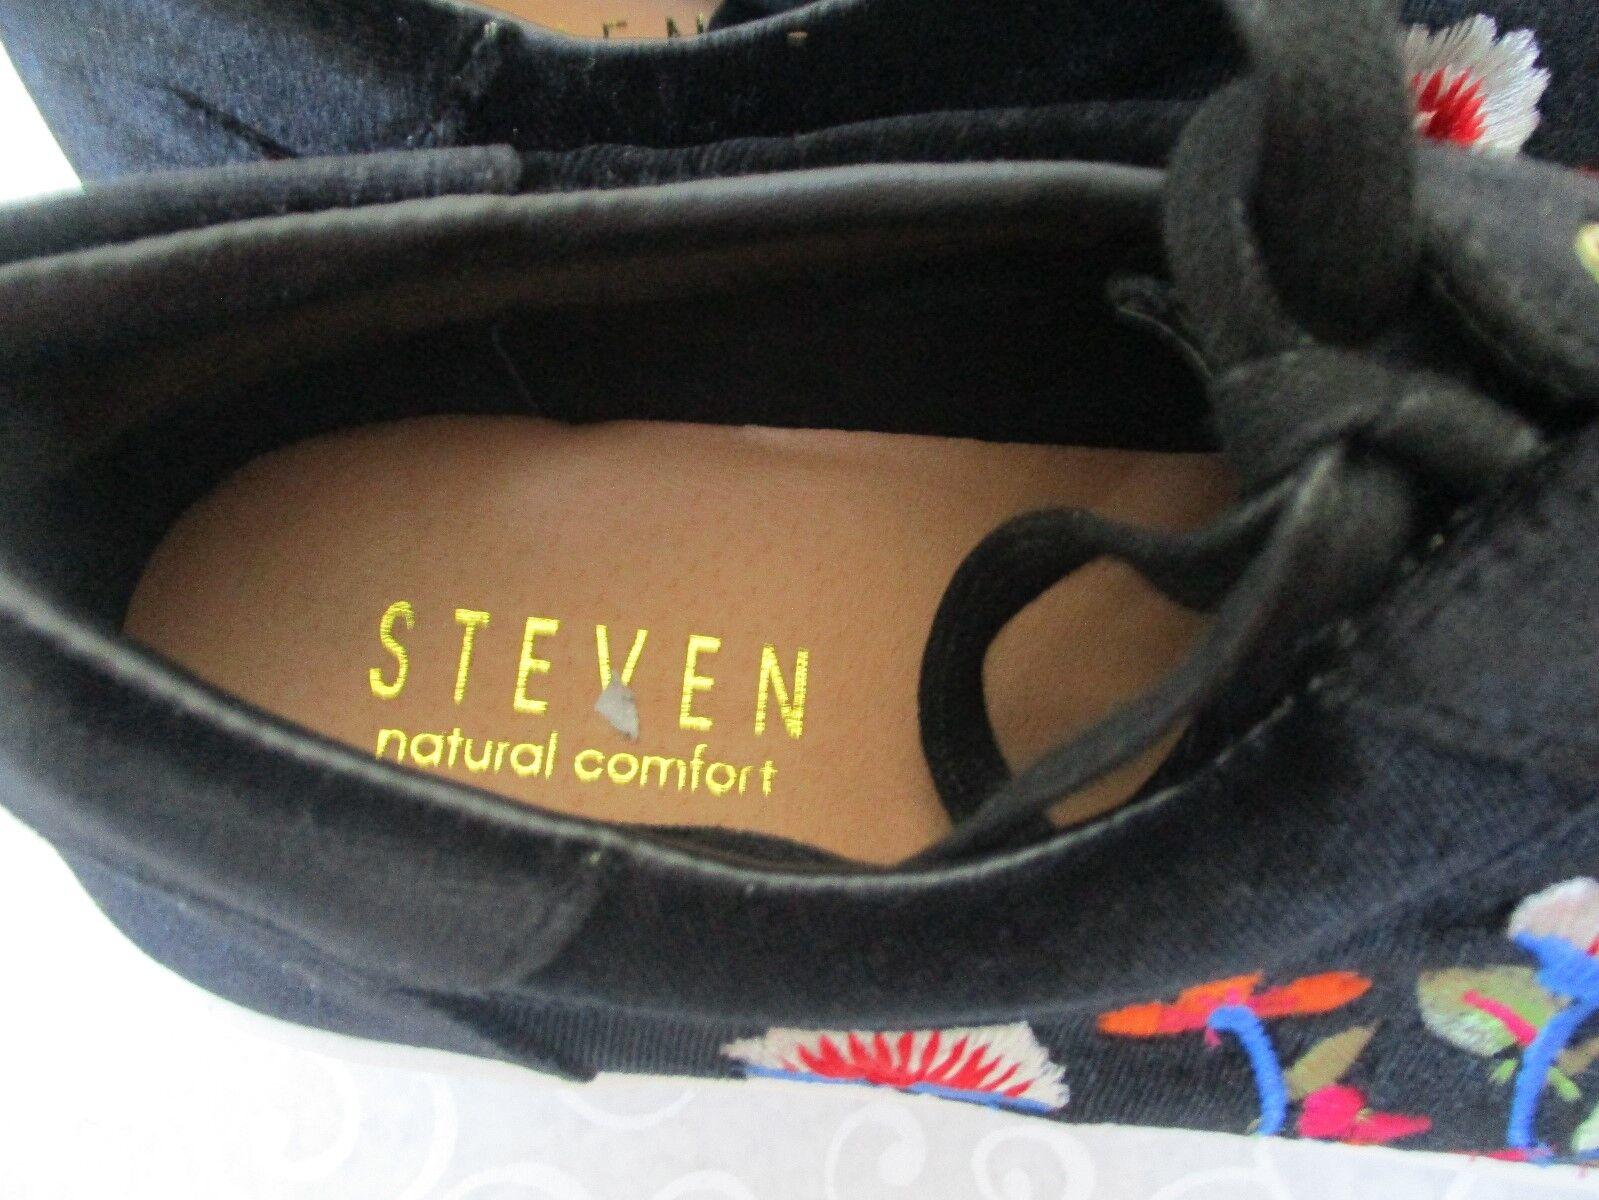 STEVNATURAL COMFORT NC NITRO BLACK EMBROIDEROT SNEAKERS Schuhe SIZE M 8 M SIZE 33ba02